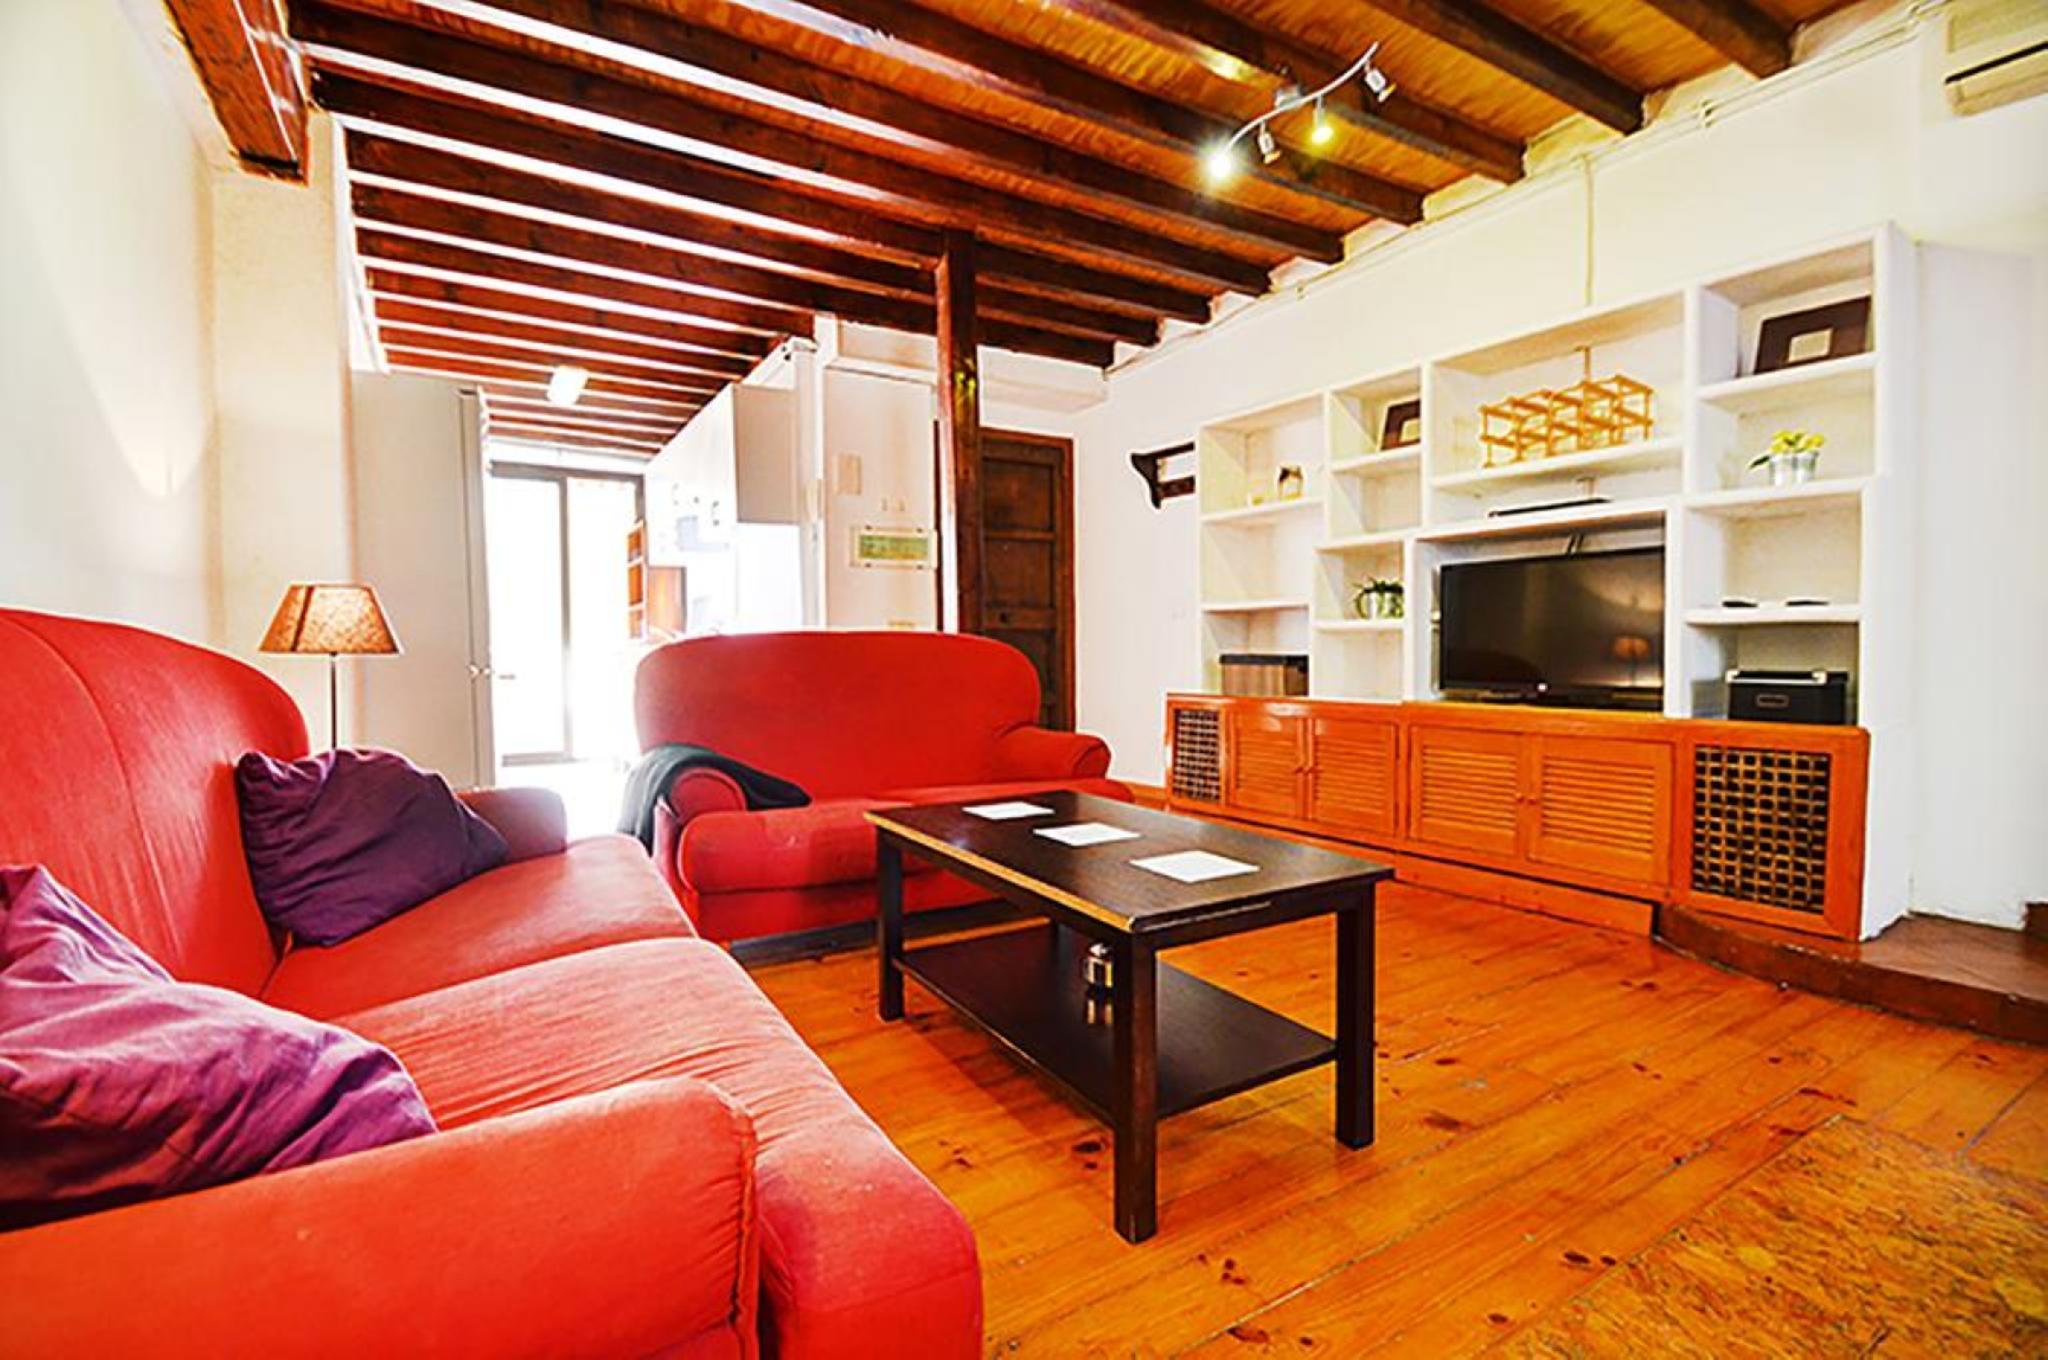 107837- Apartment in Palma